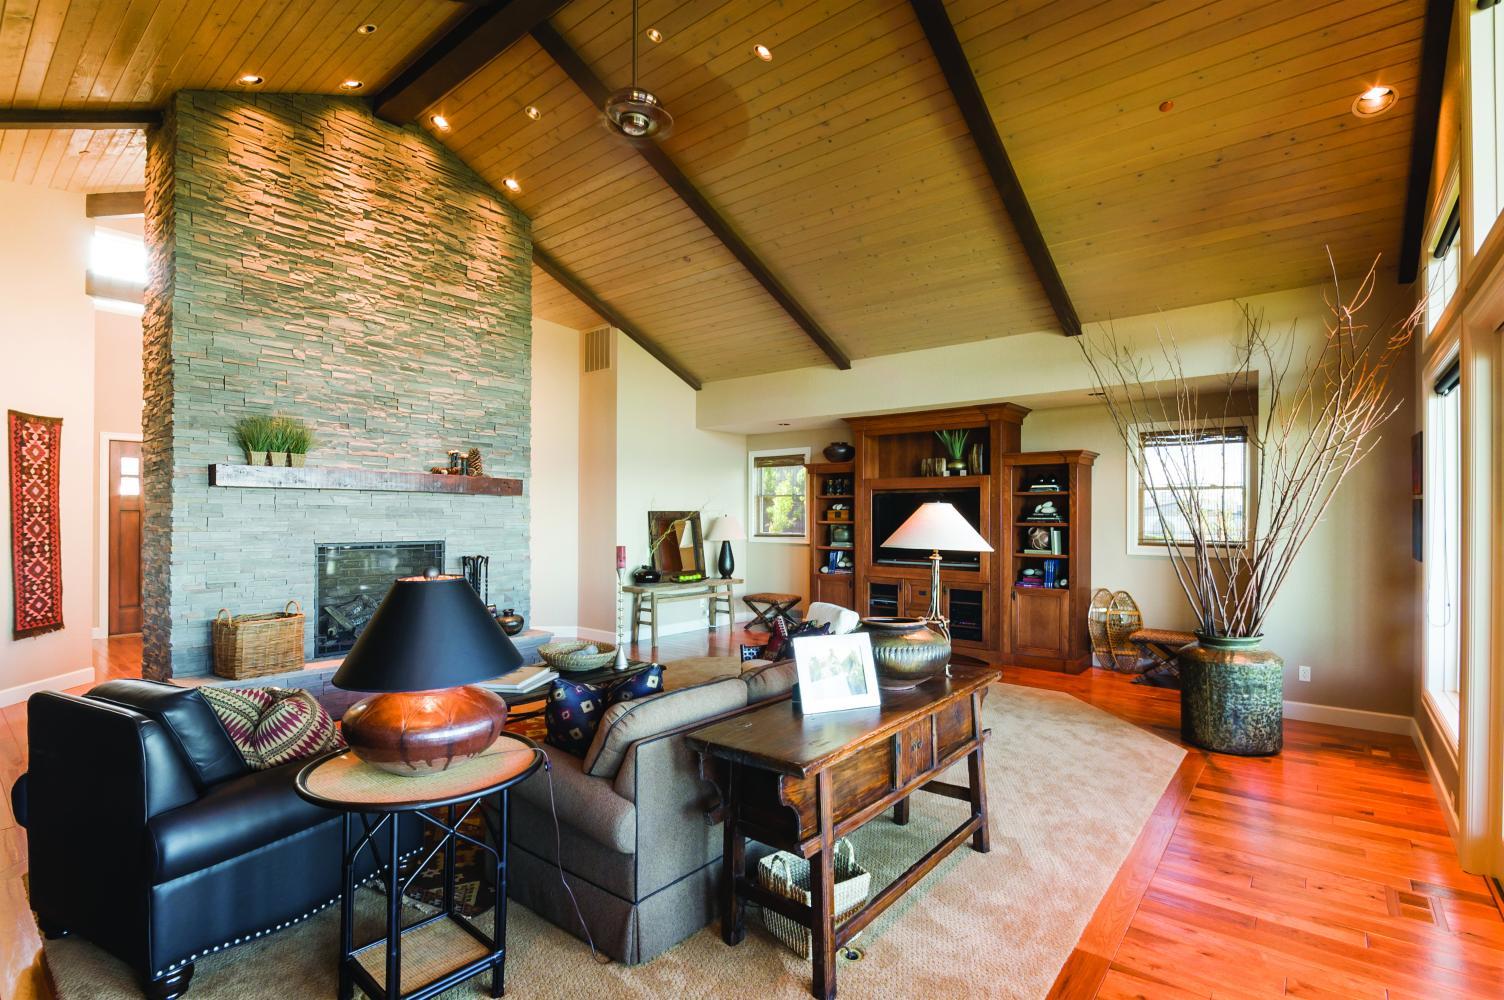 6 Quot Super Sloped Ceiling Led Baffle Inserts Elco Lighting